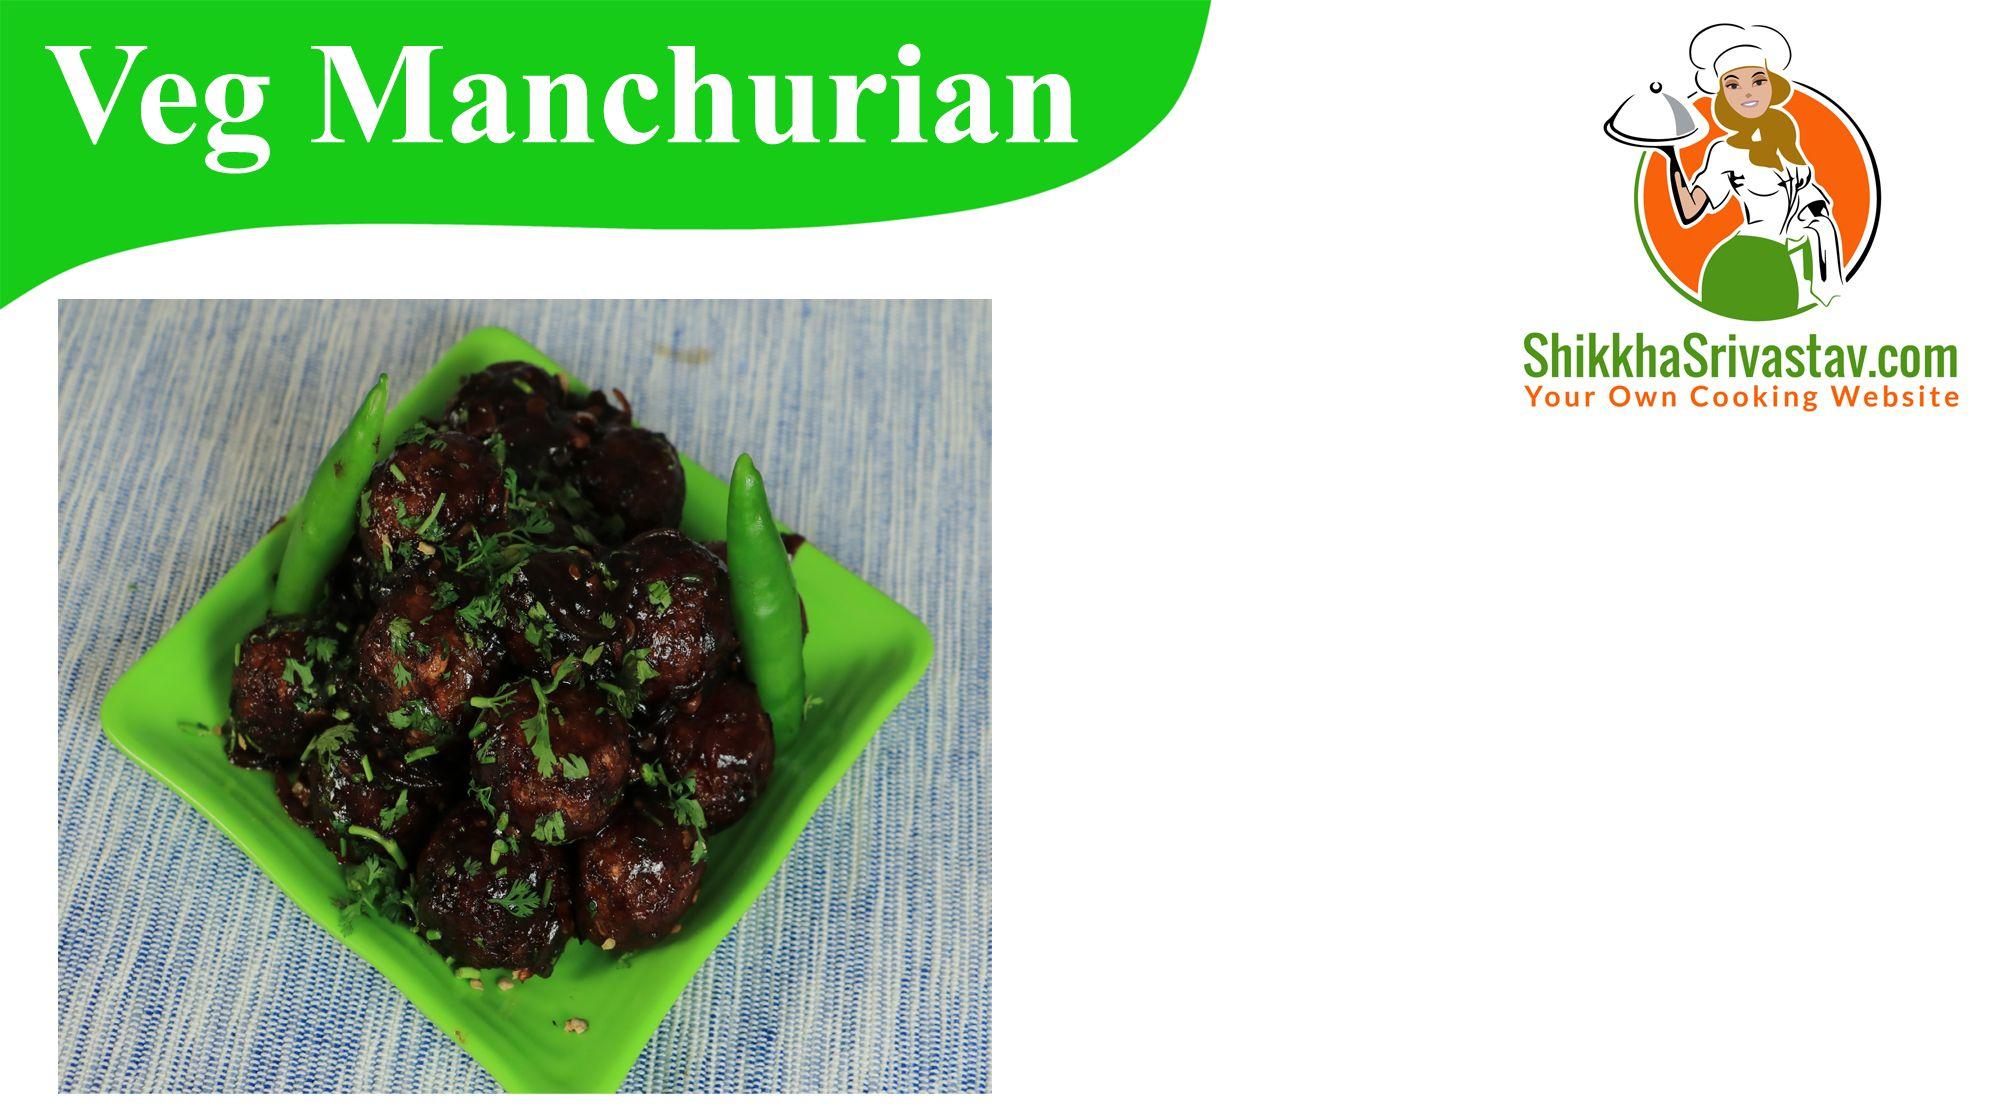 Veg manchurian recipe in hindi how to make veg manchurian at home veg manchurian recipe in hindi how to make veg manchurian at home in hindi language forumfinder Images